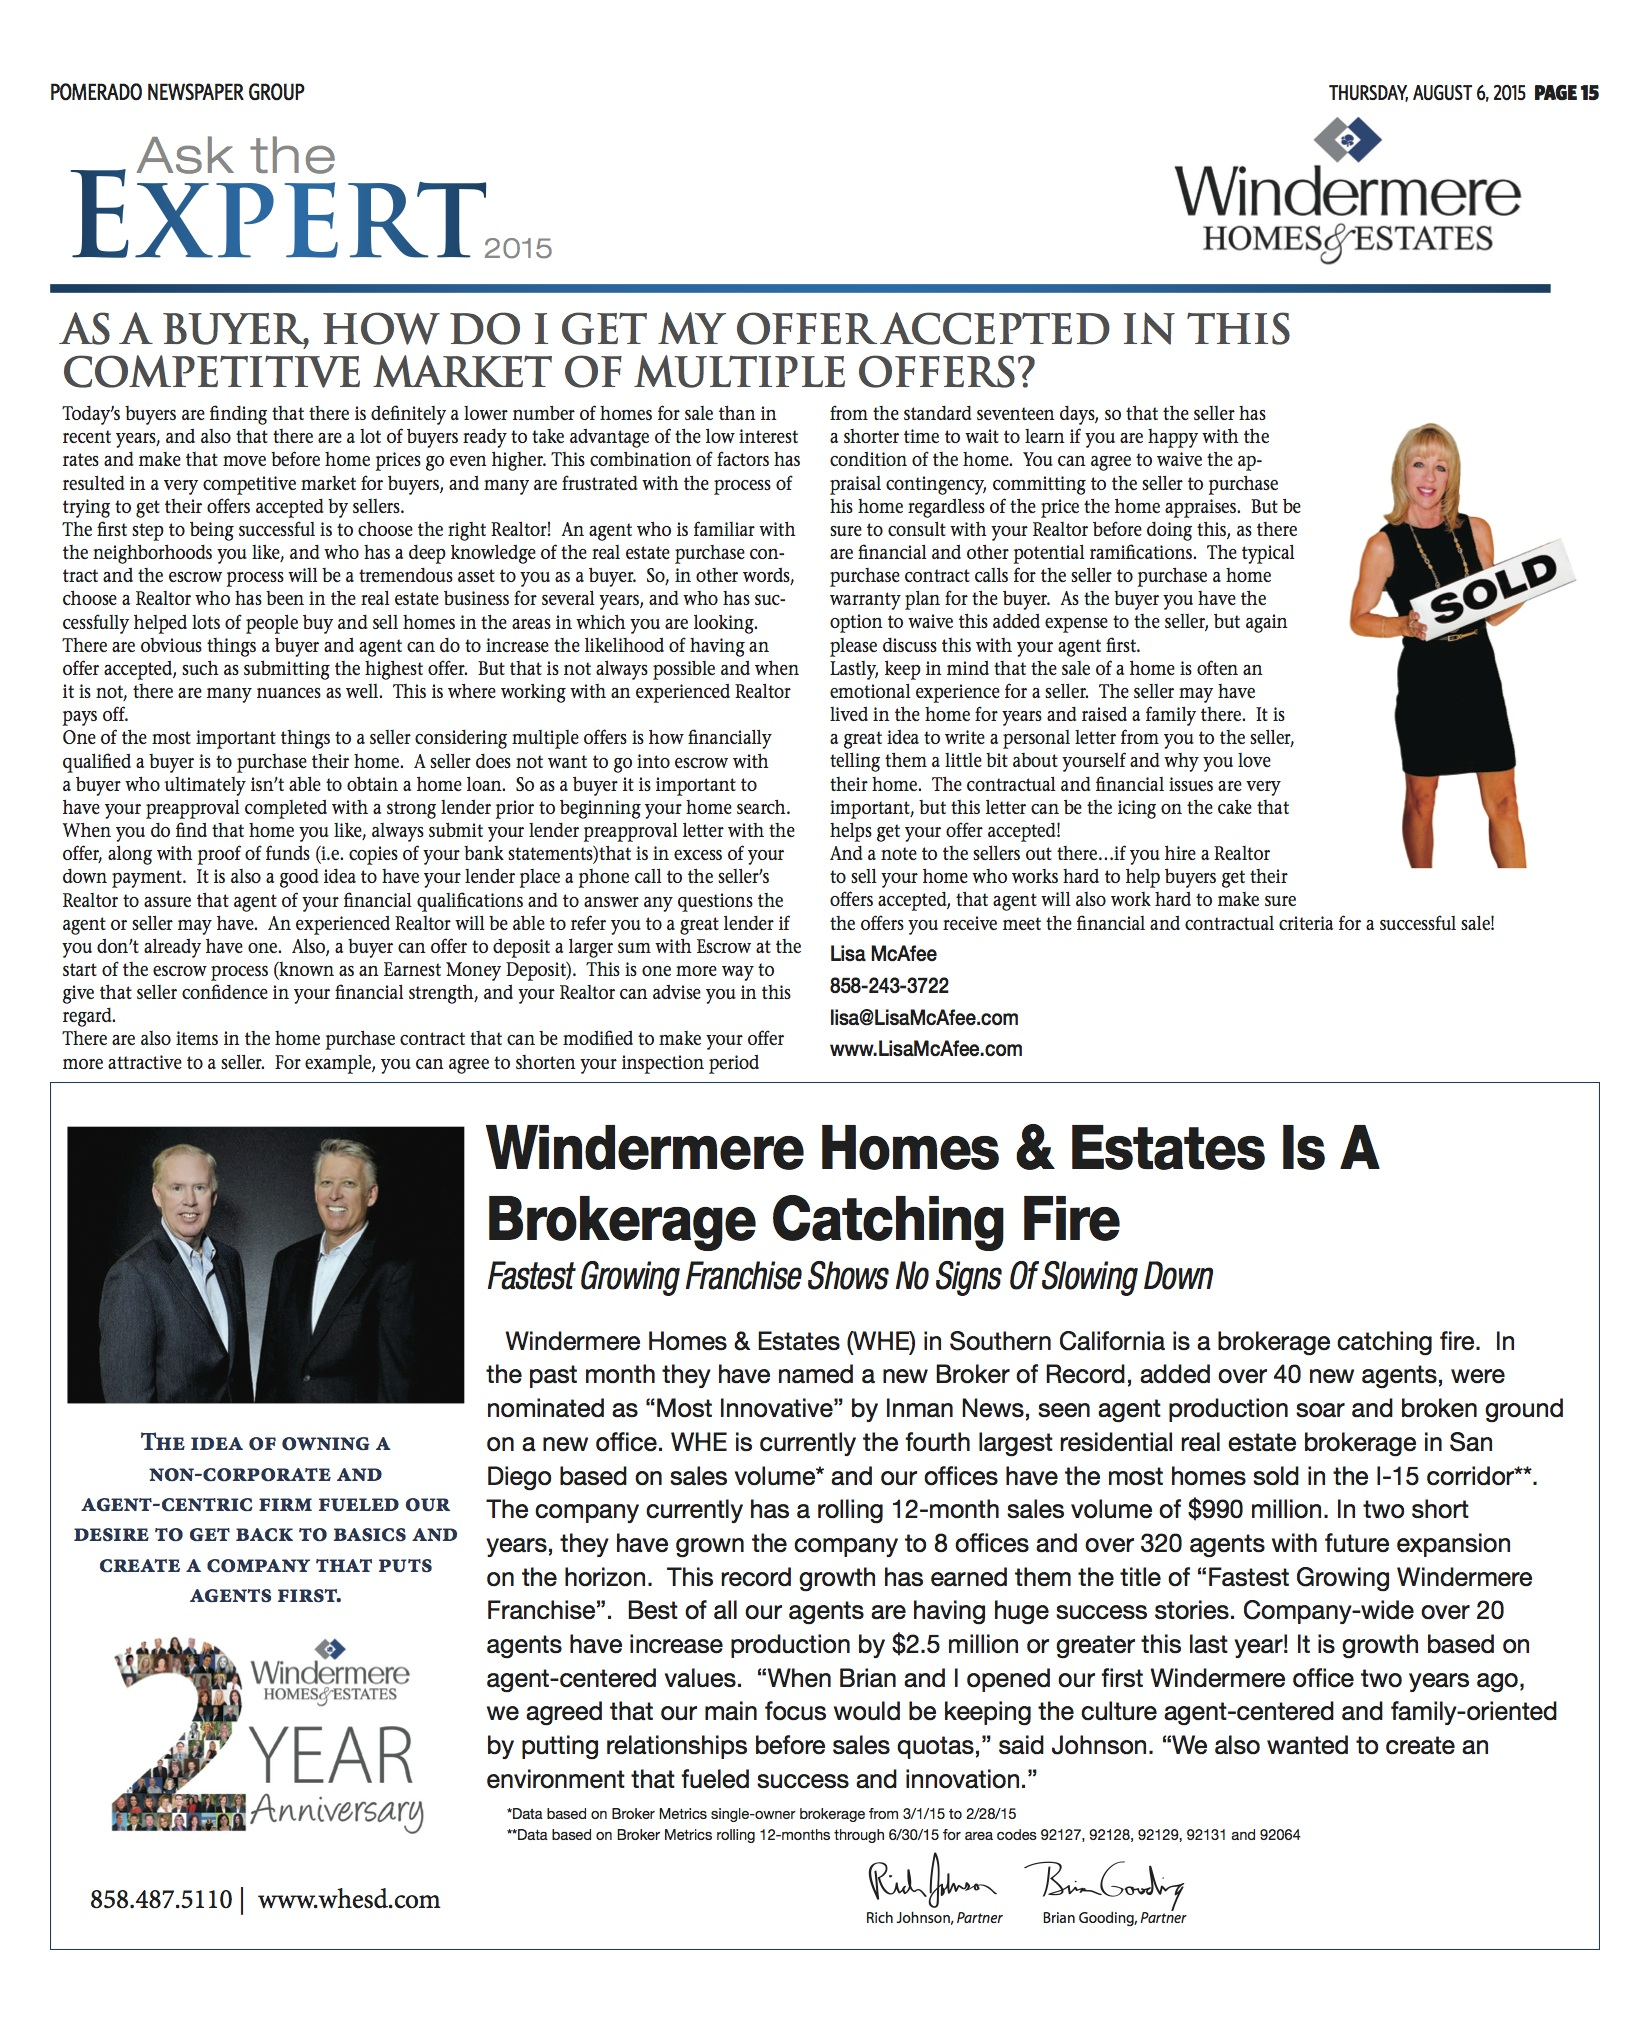 Lis McAfee Ask the Expert 08-06-15 0806_POM_pA15